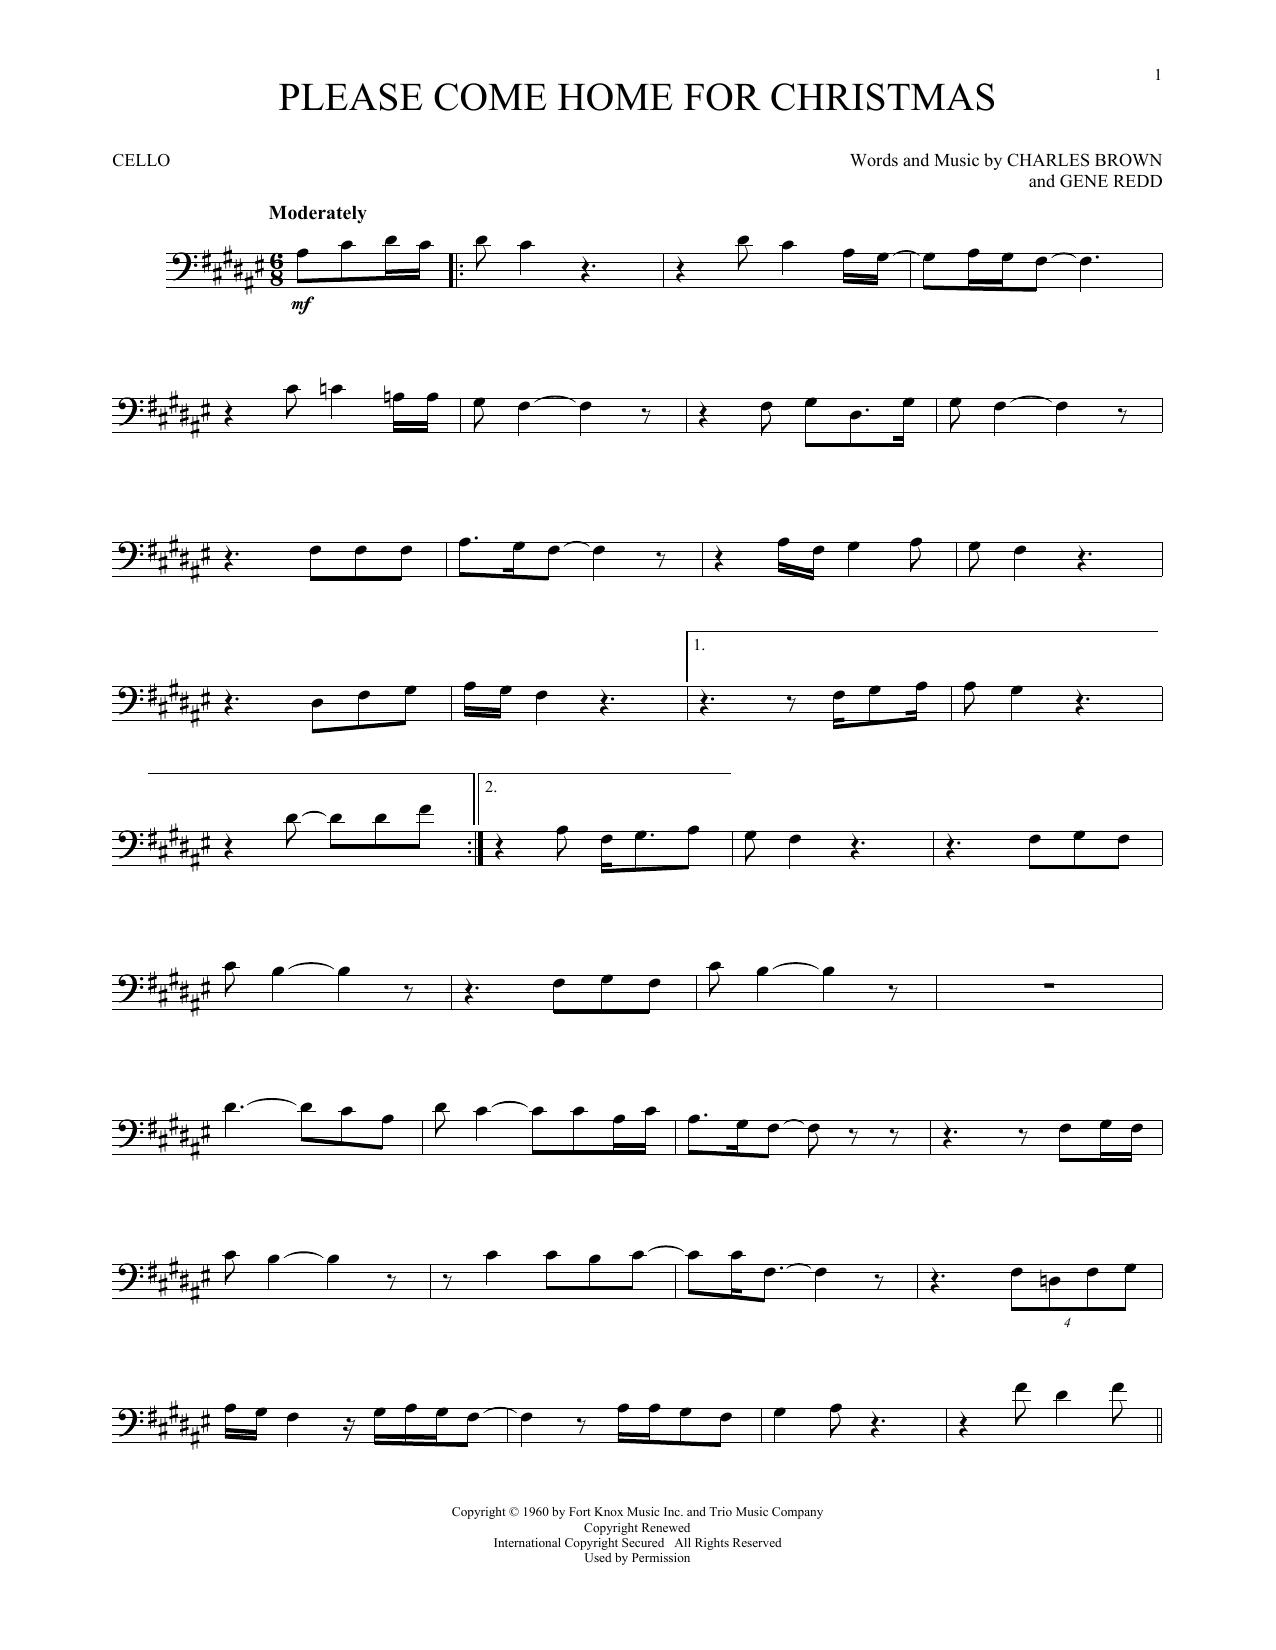 Please Come Home For Christmas (Cello Solo)